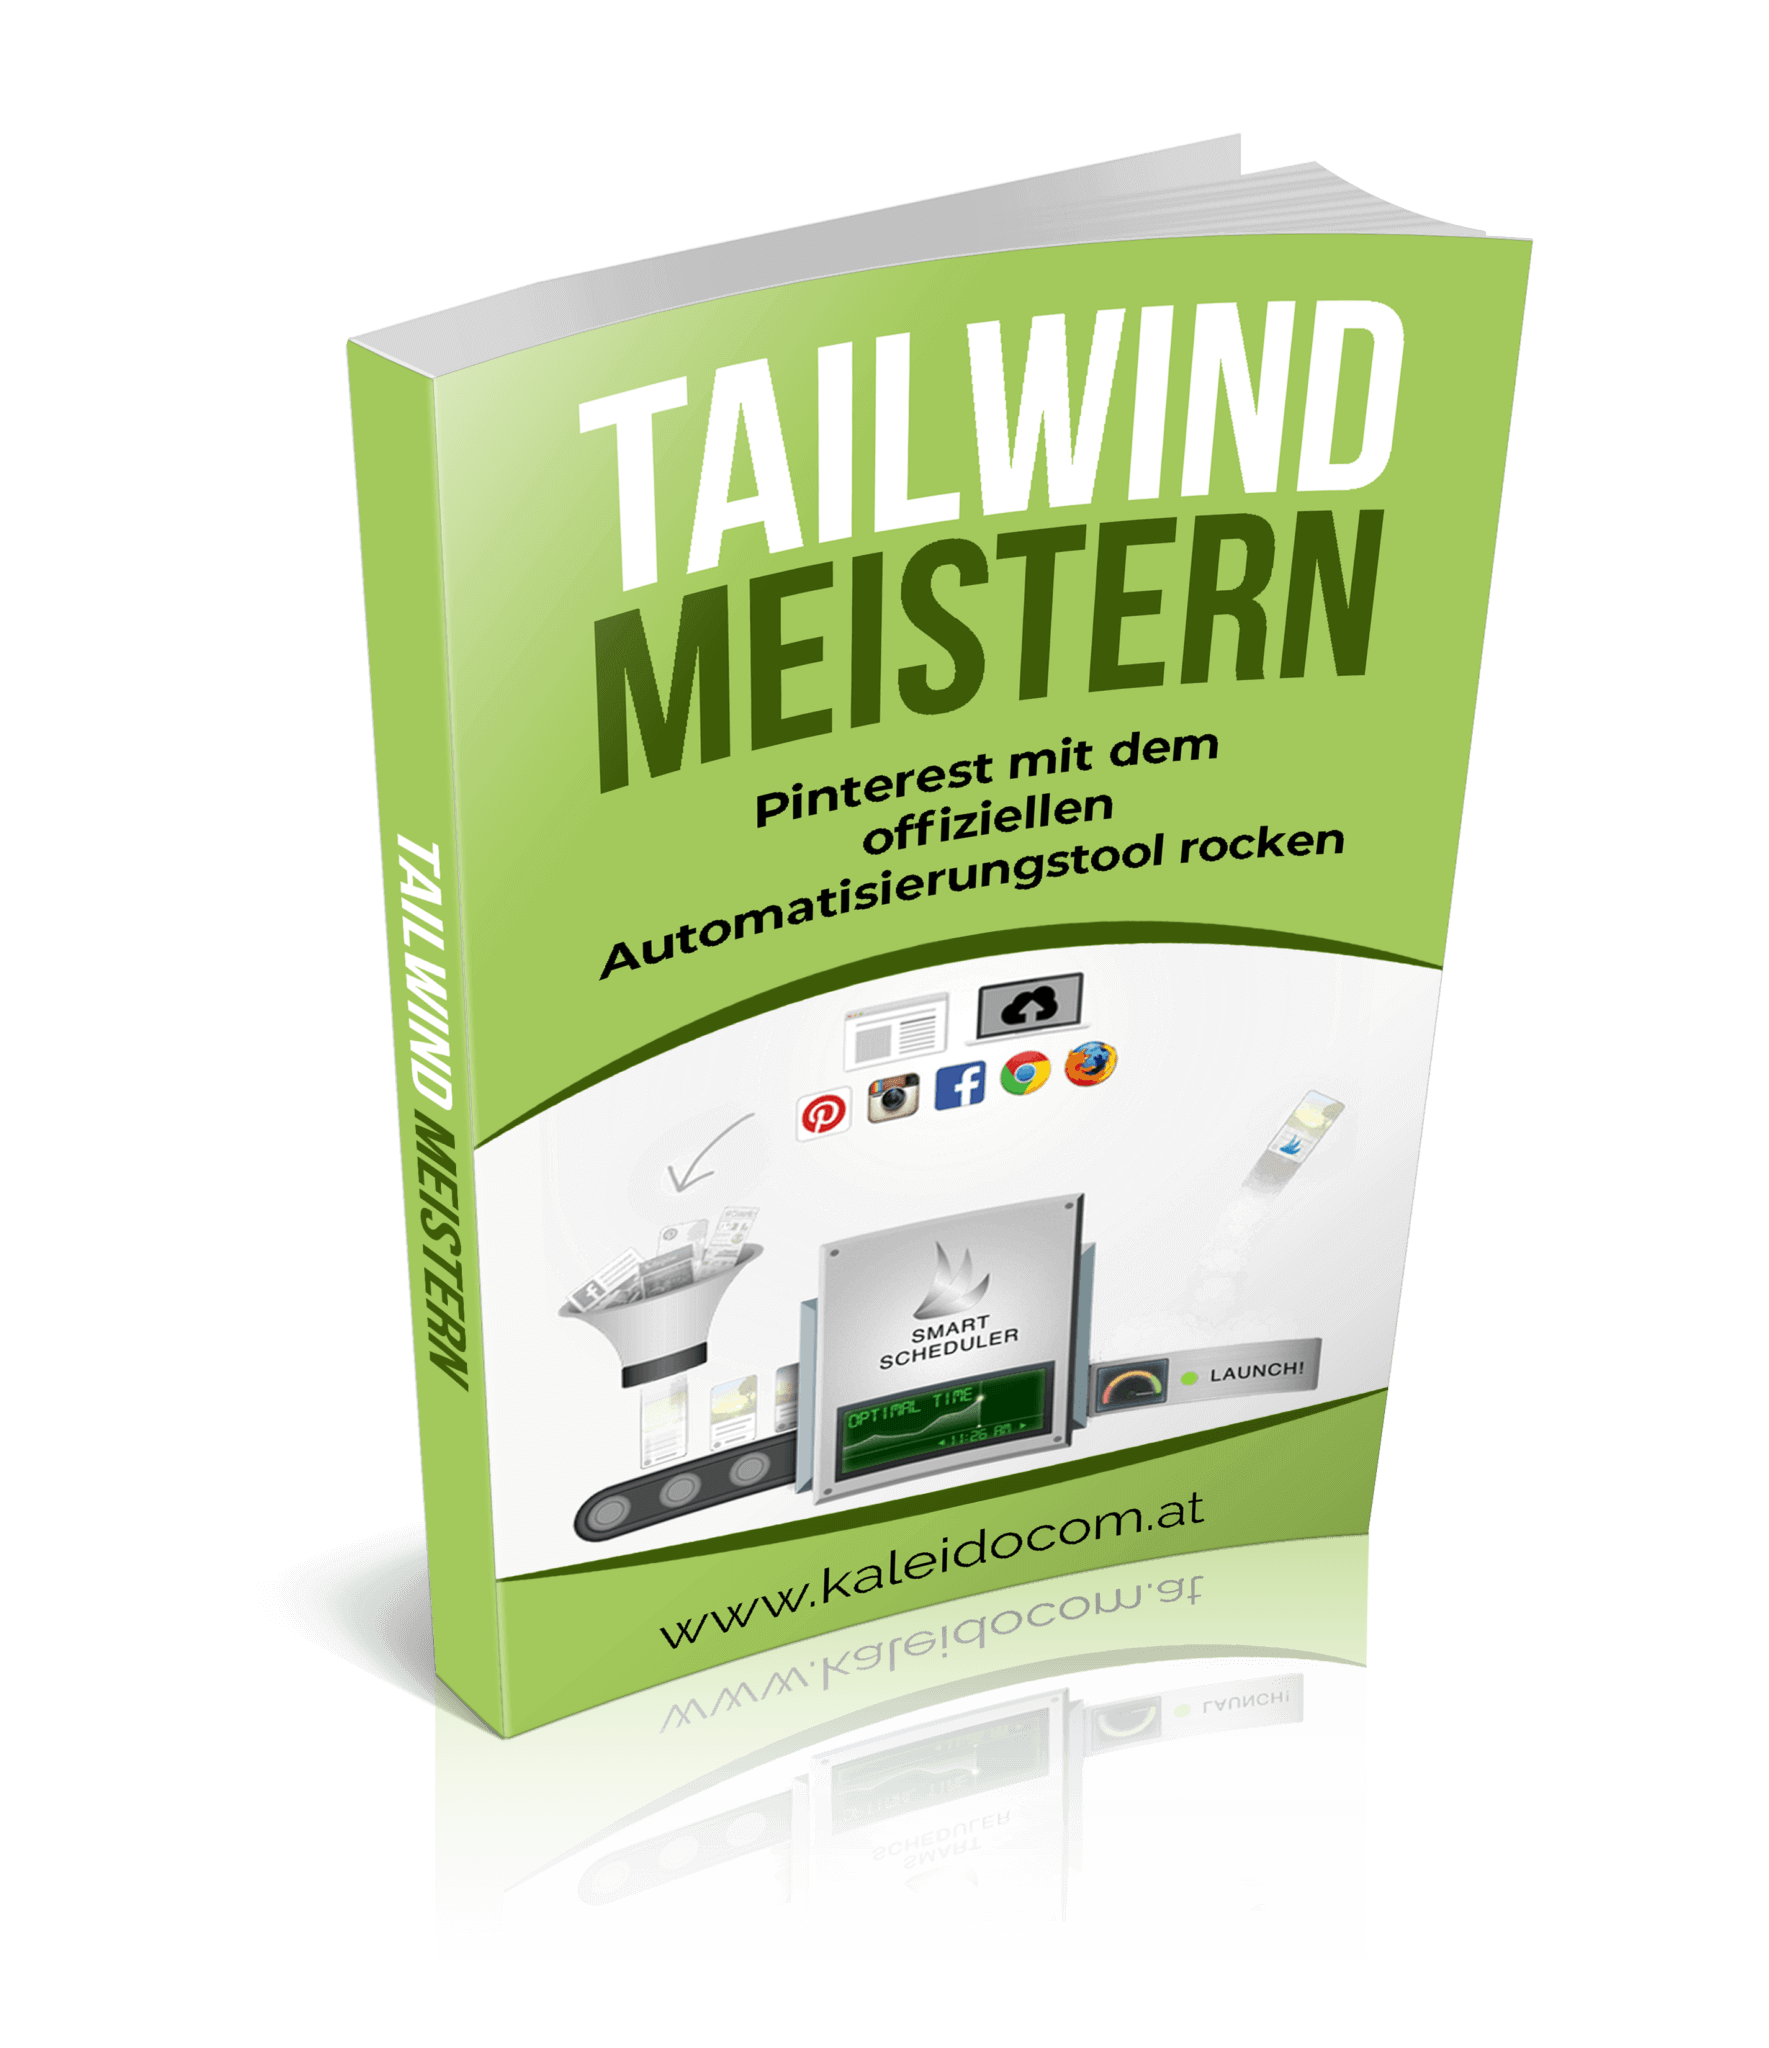 Tailwind Anleitung deutsch